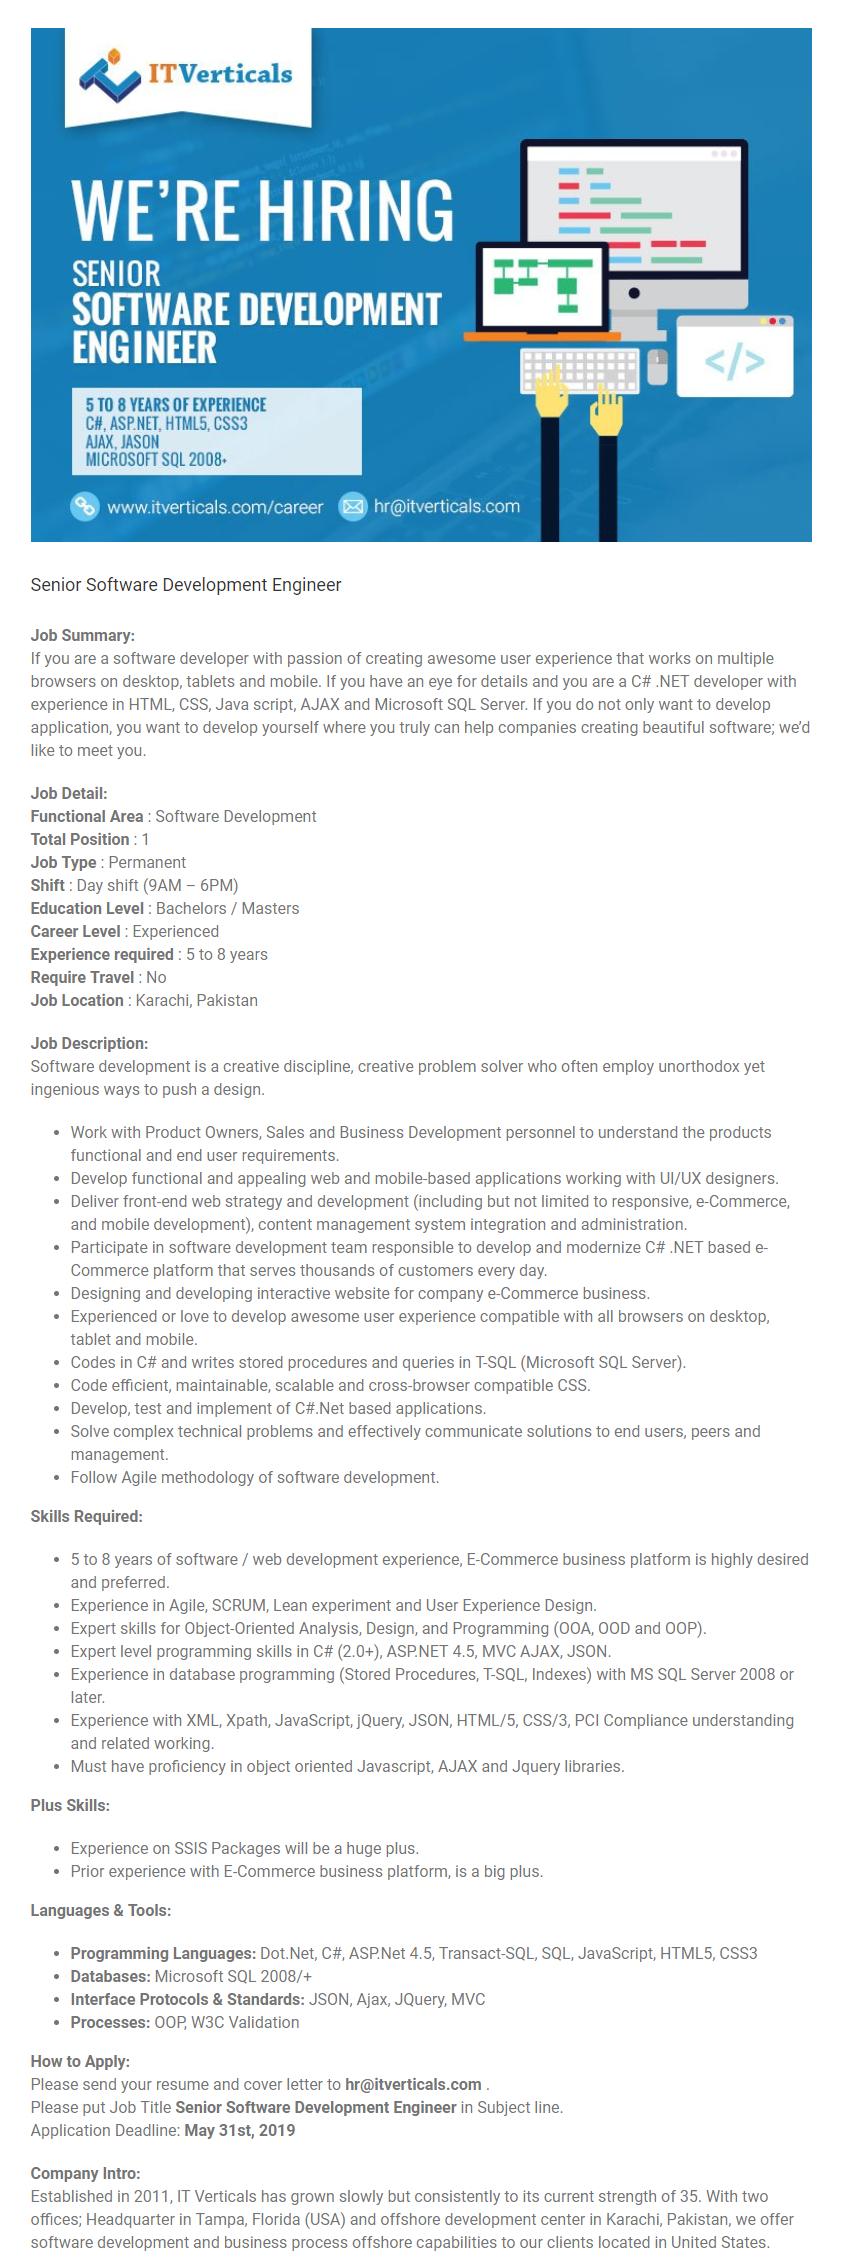 Senior Software Development Engineer Job in Karachi